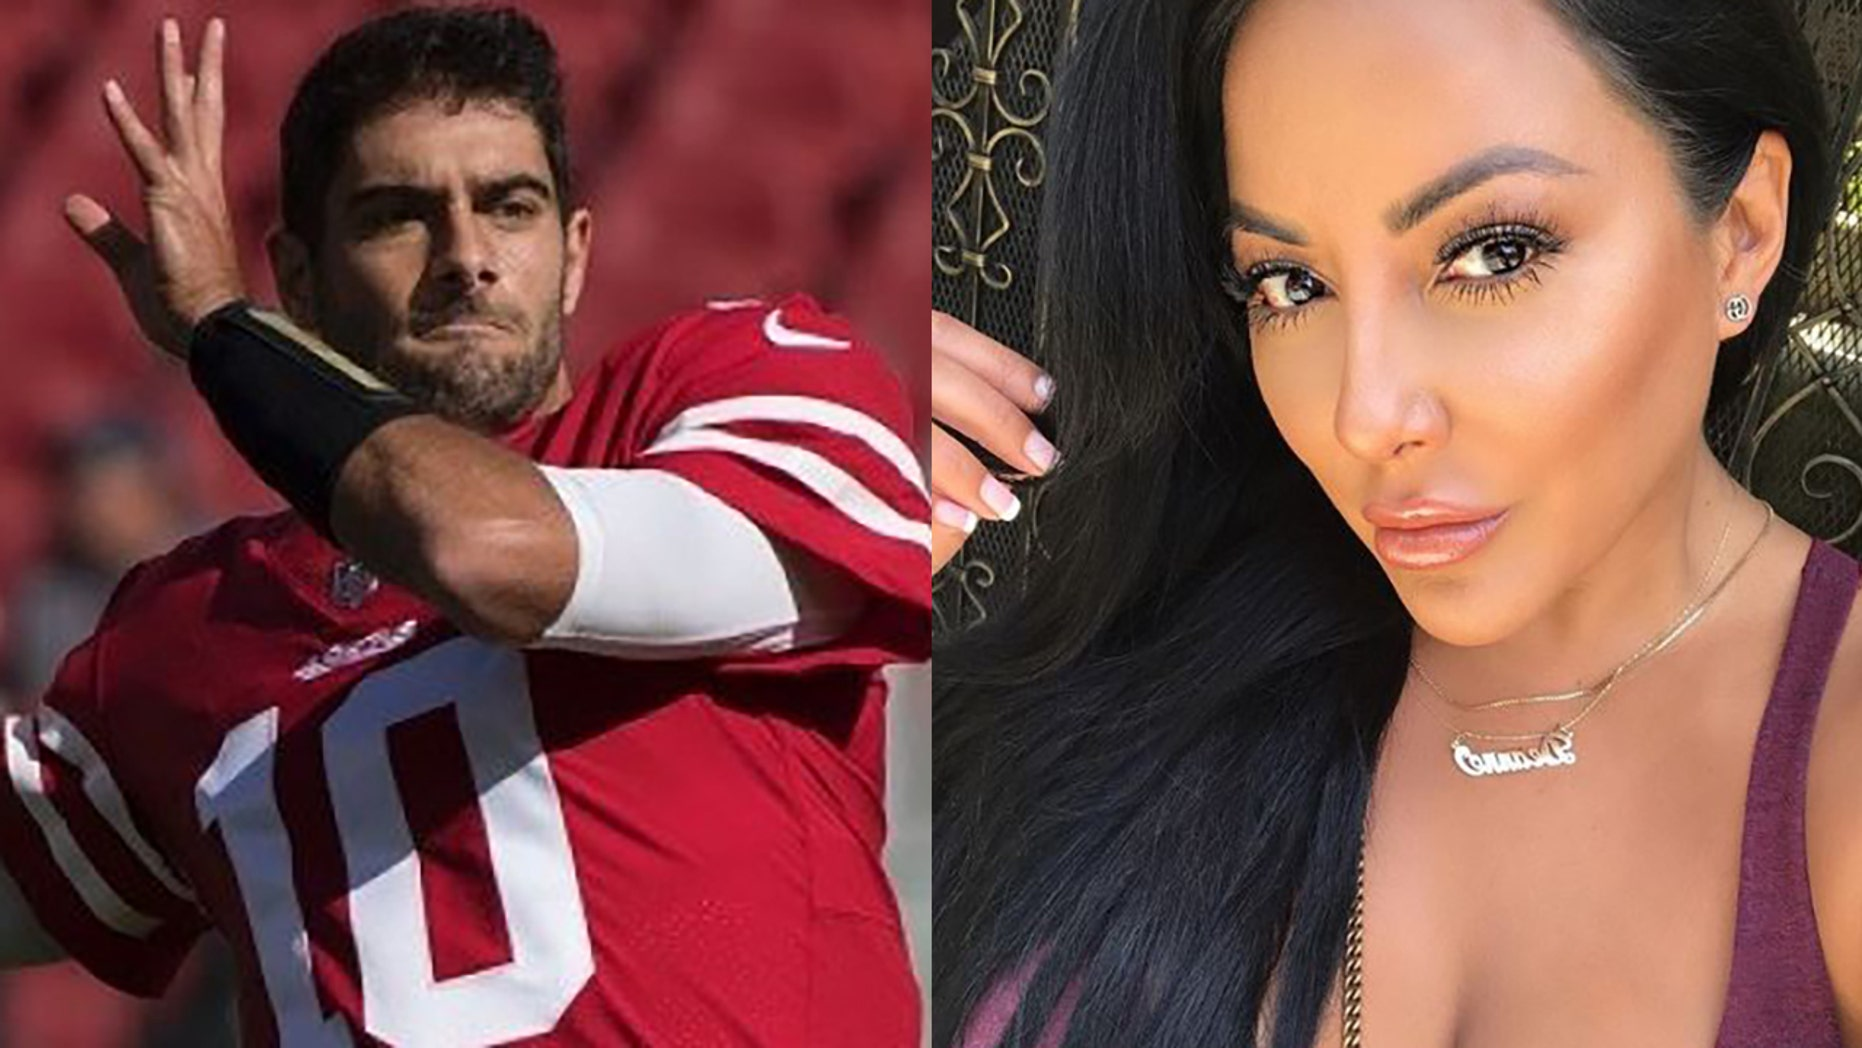 Jimmy Garoppolo reportedly went on a date with porn star Kiara Mia.